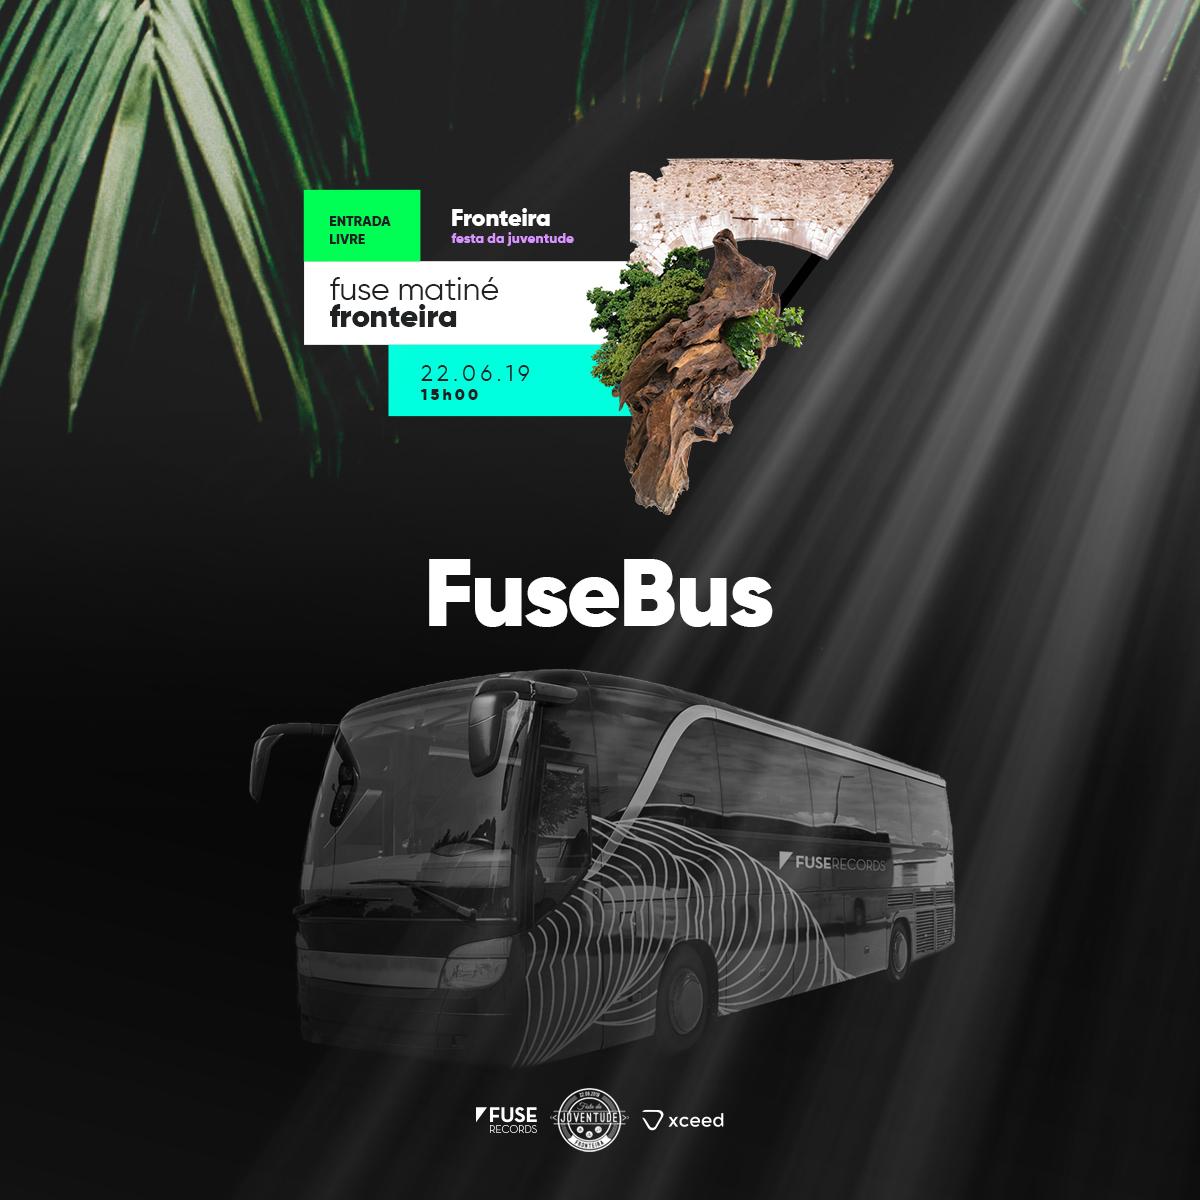 FuseMatine_220619_Profile_FuseBus.jpg